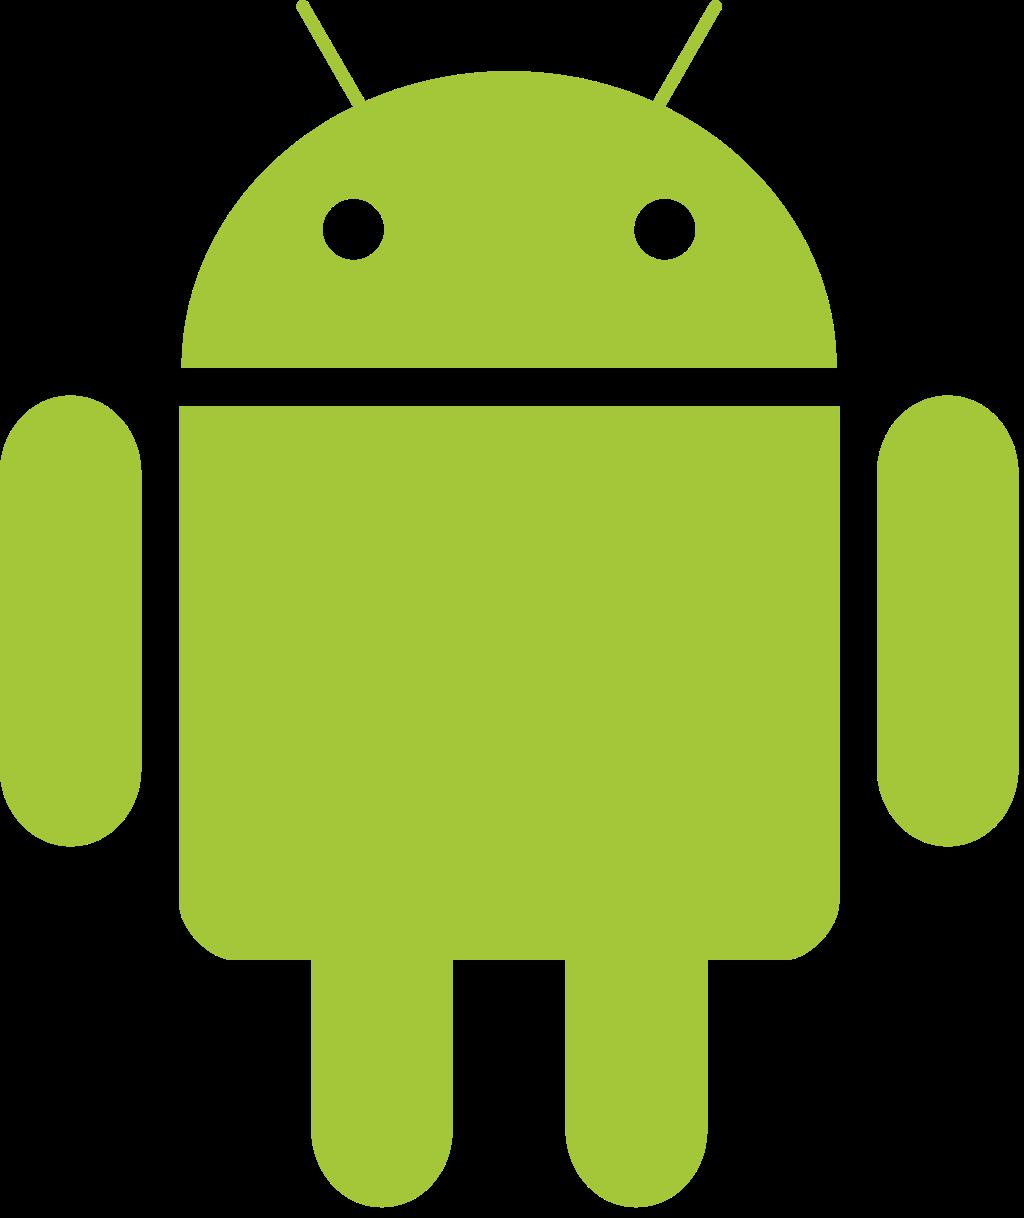 clip art freeuse library android transparent original #88972074